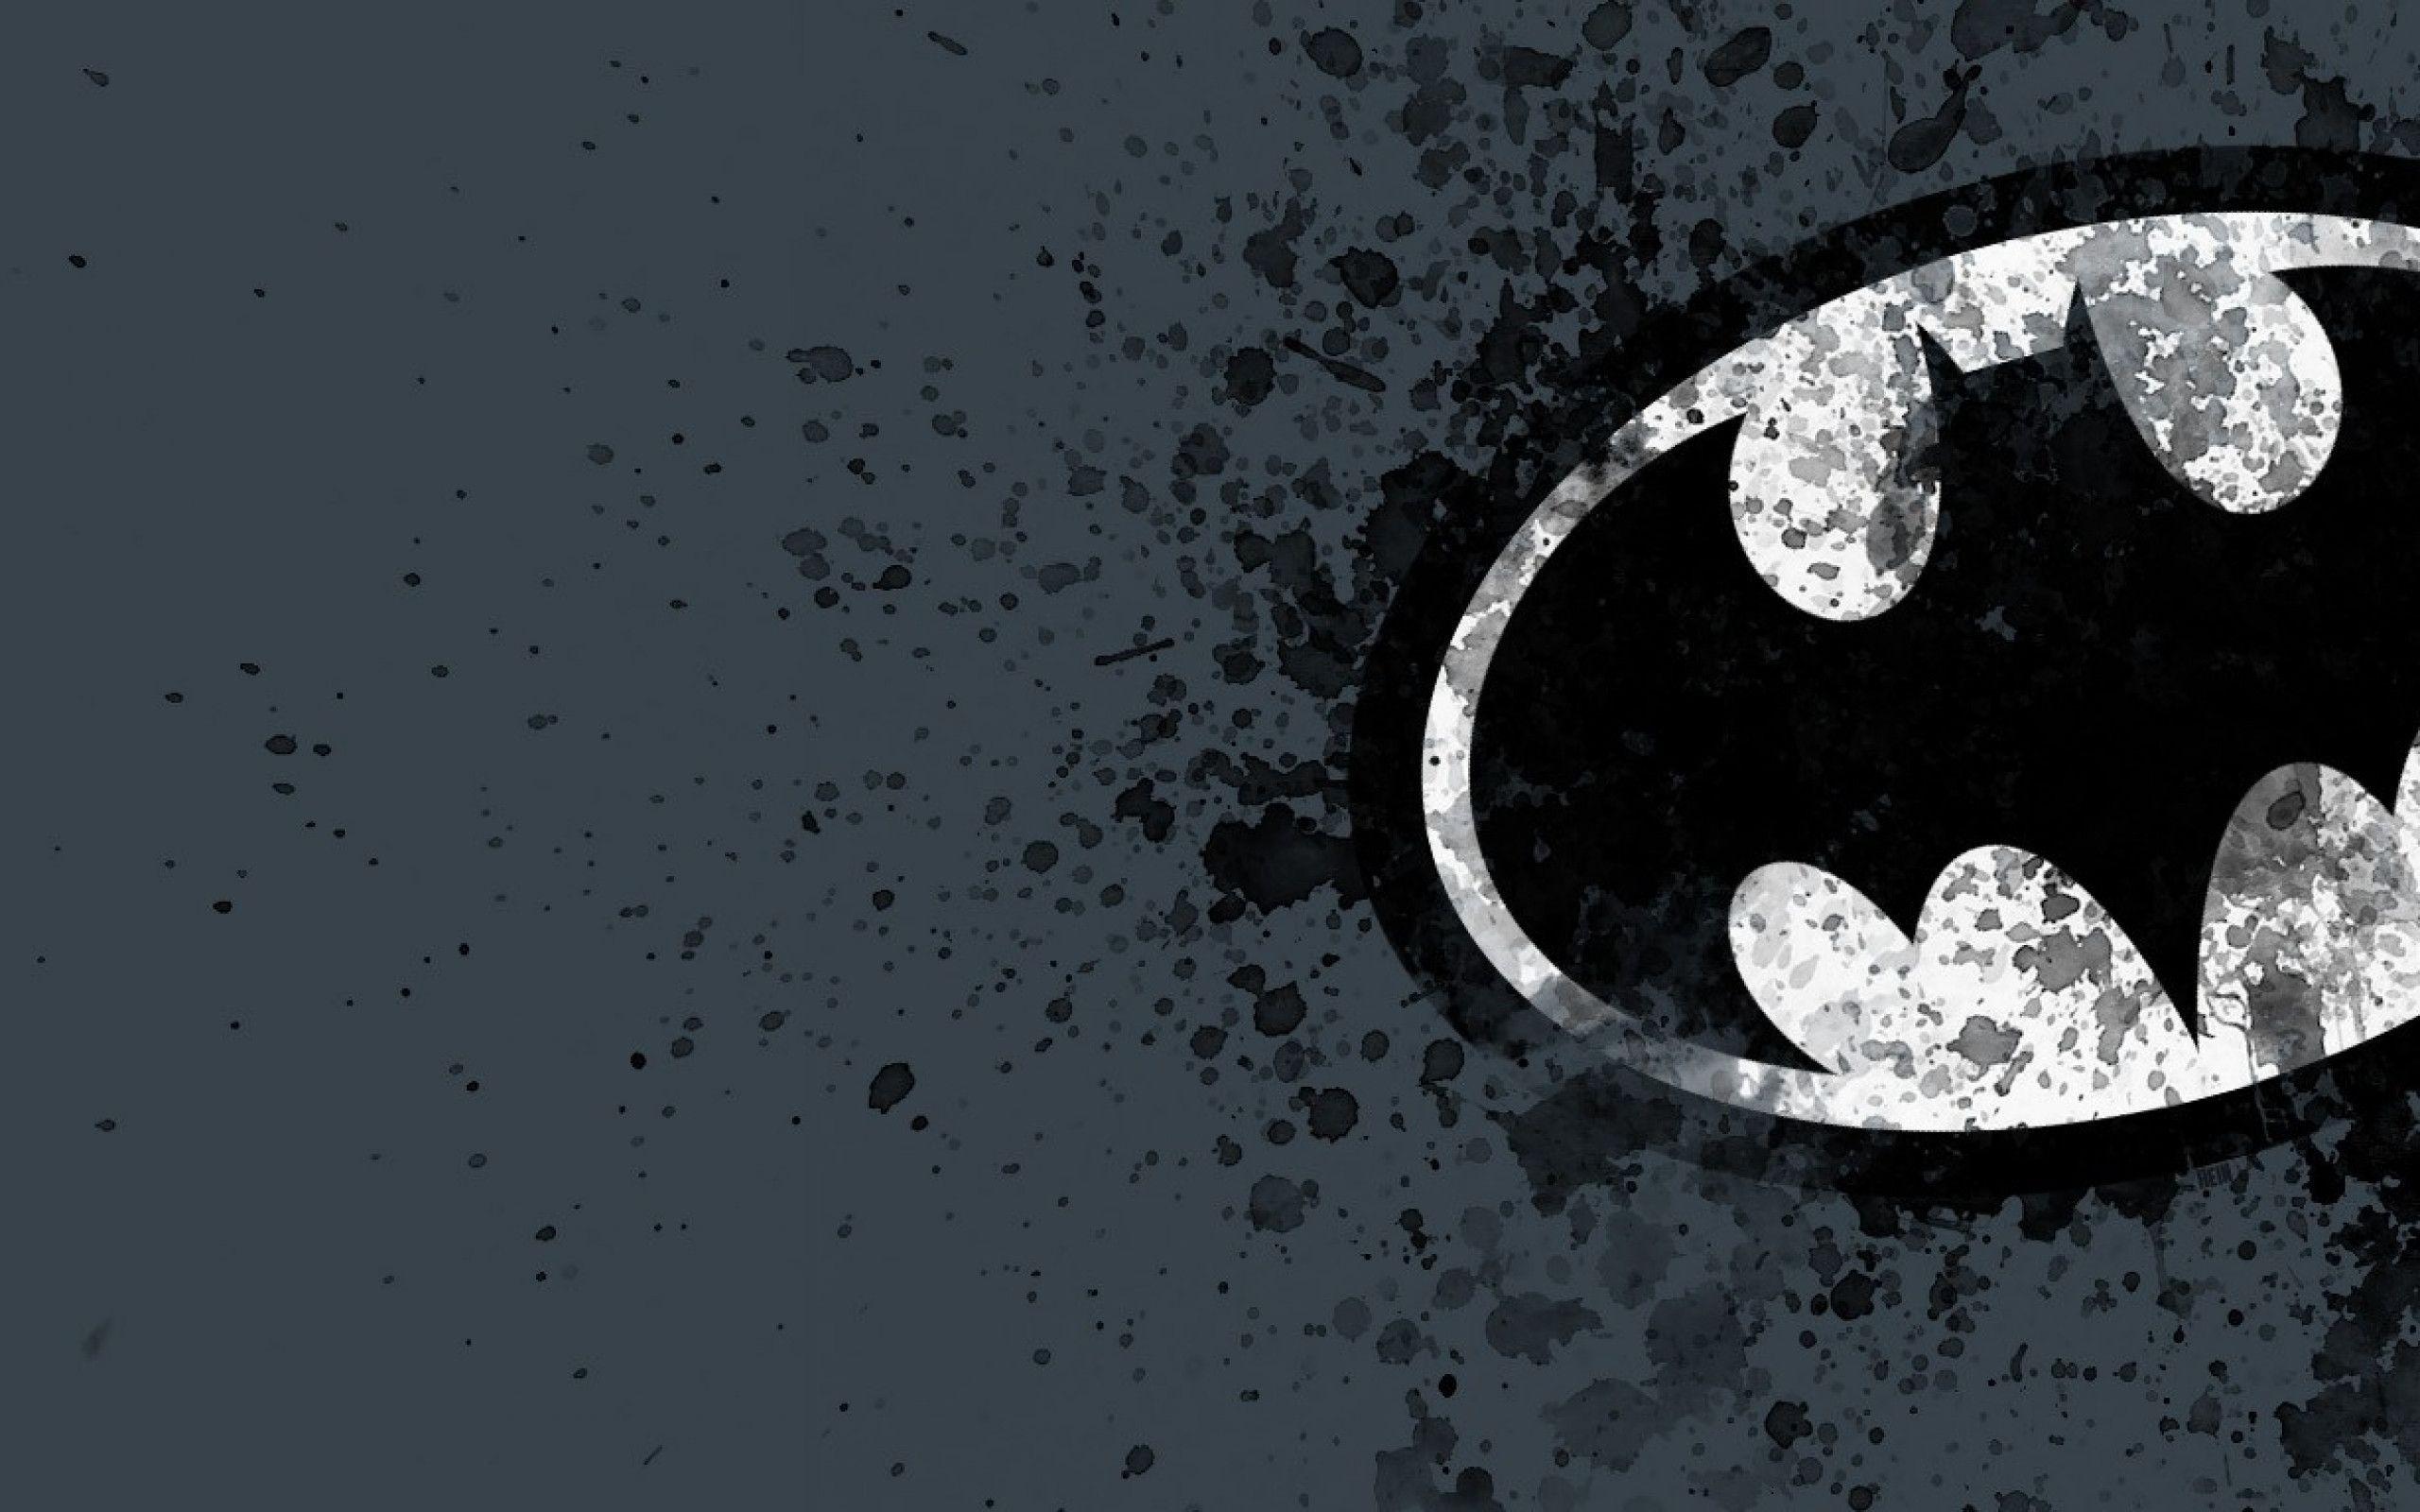 Batman HD Wallpaper 1 Download Free High Resolution Backgrounds